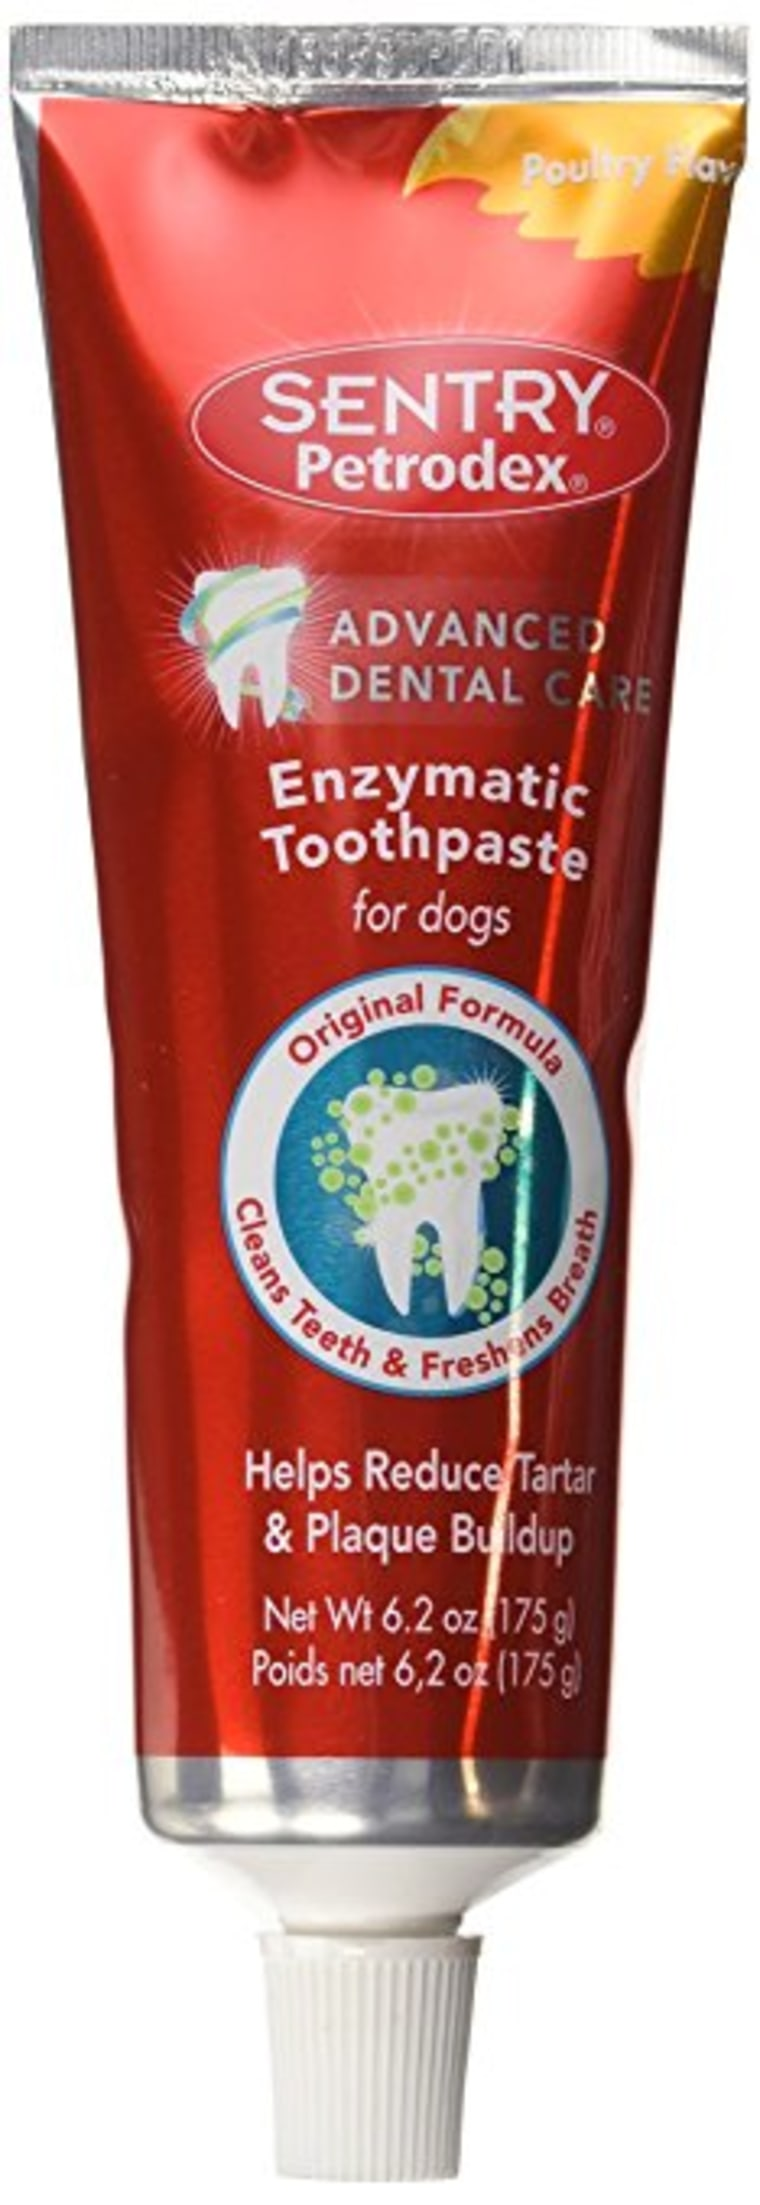 Petrodex Enzymatic Toothpaste